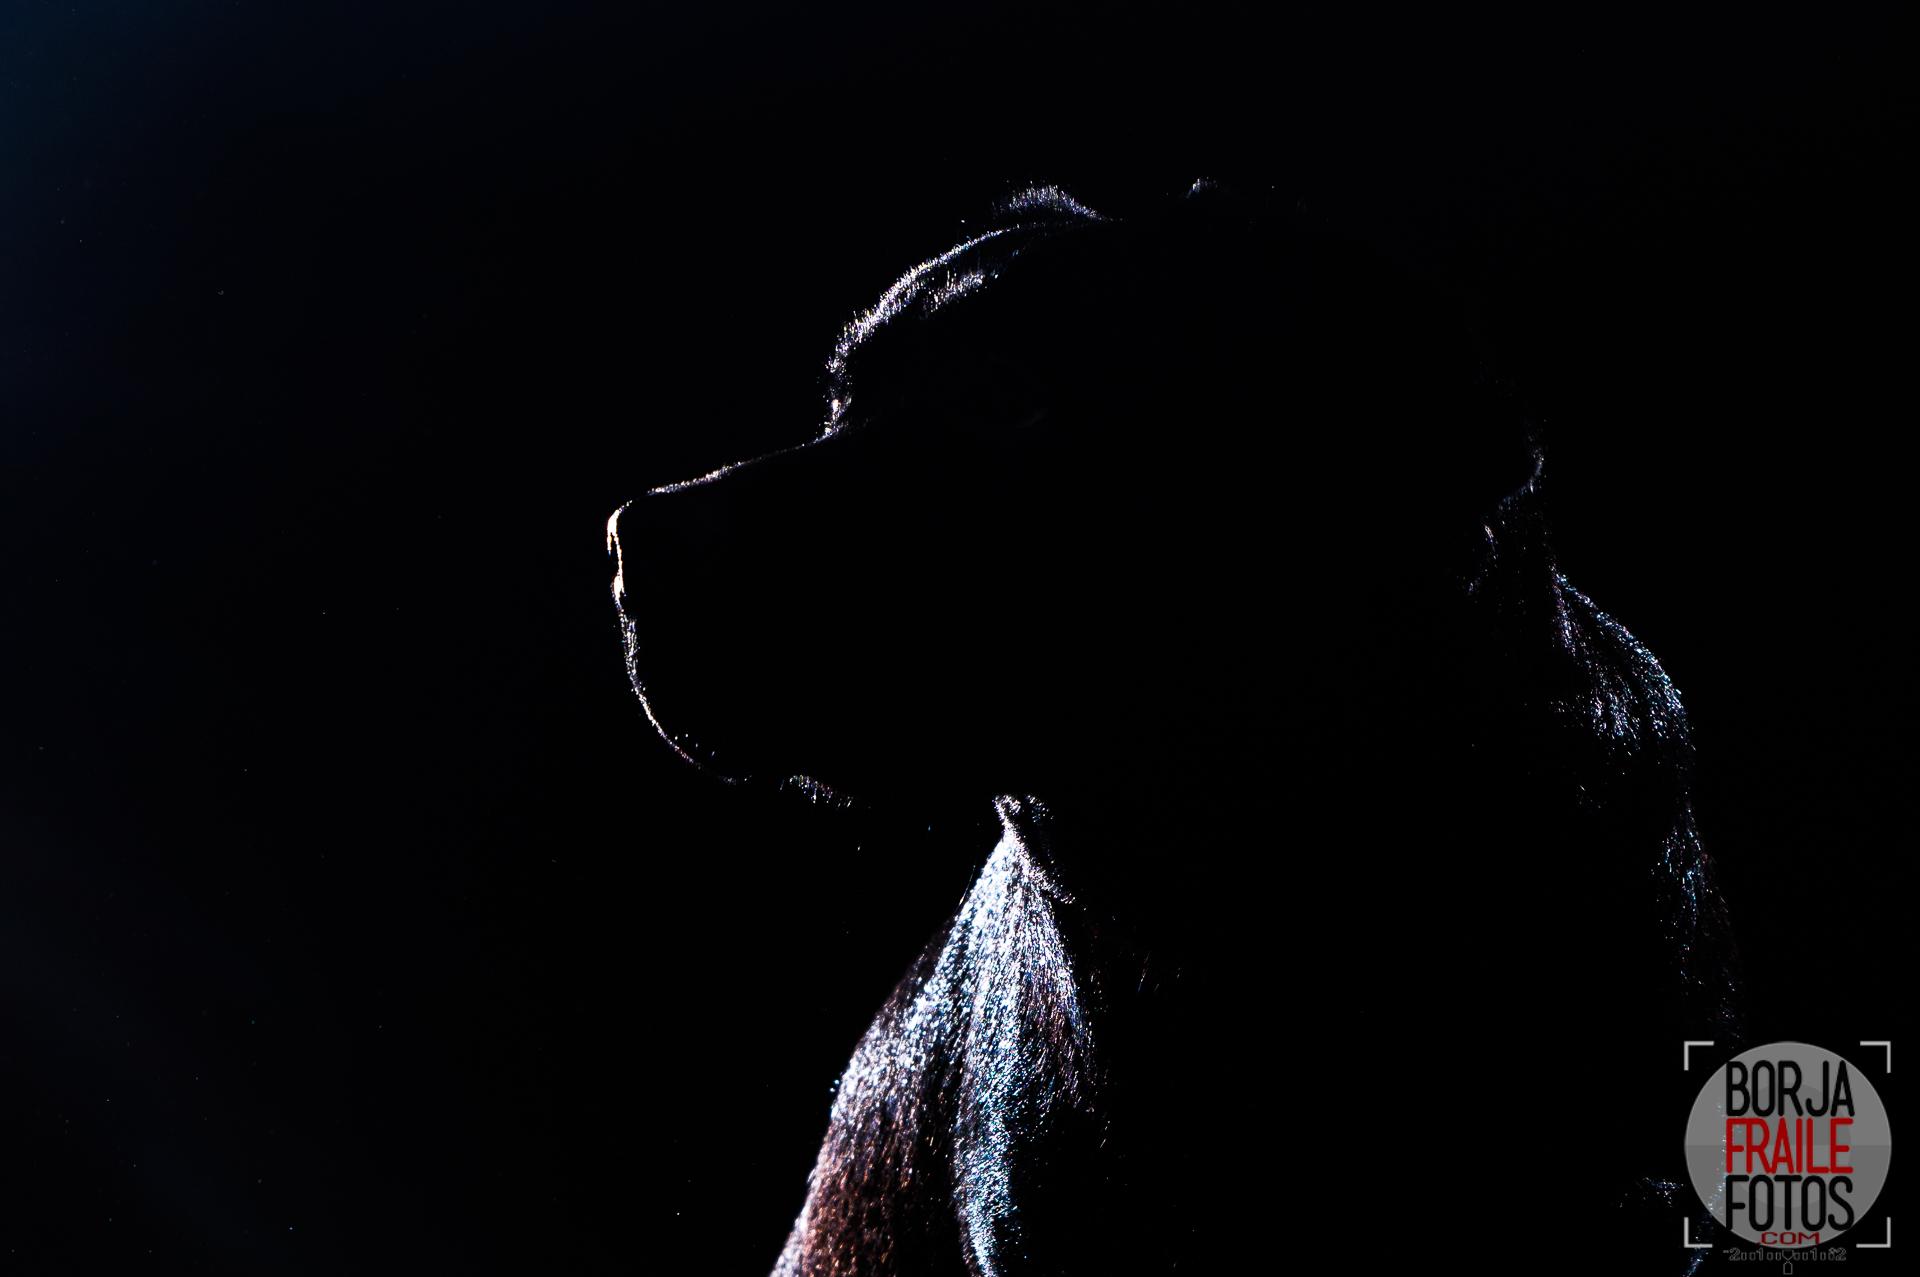 20210102panceta304 - Panceta, perra modelo... fotos de perros.